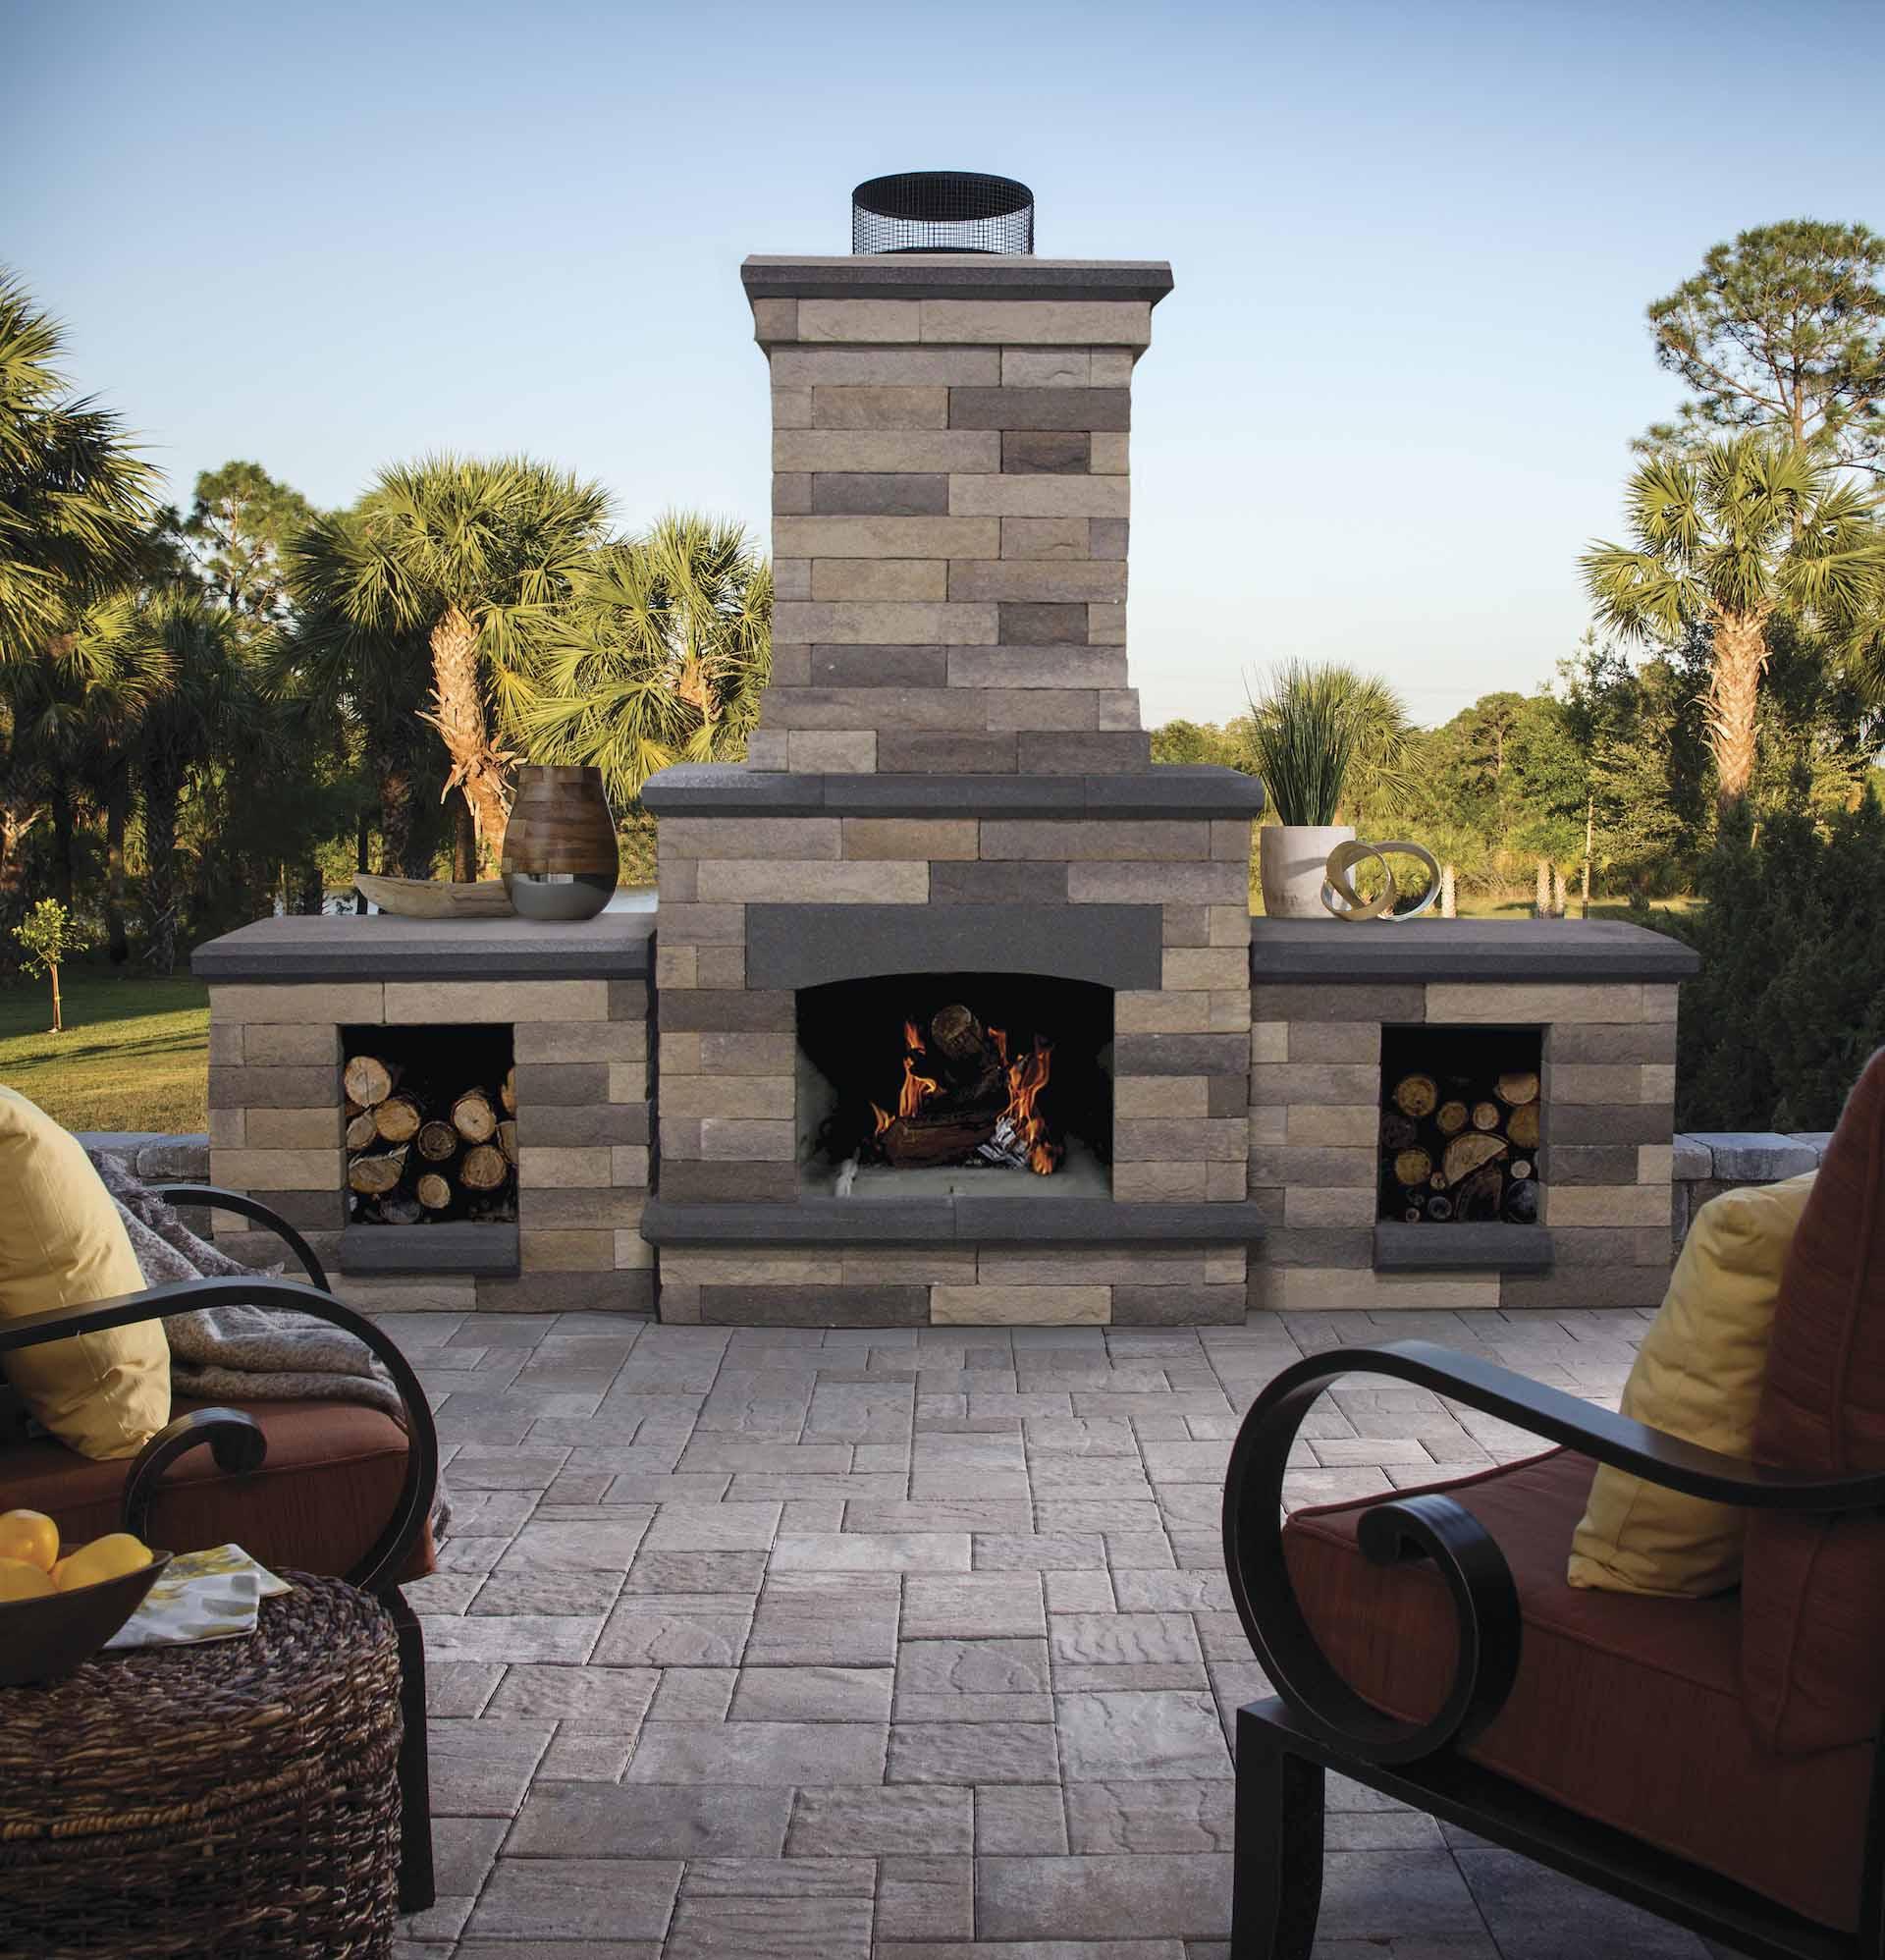 outdoor fireplace installation san diego blogs workanyware co uk u2022 rh blogs workanyware co uk